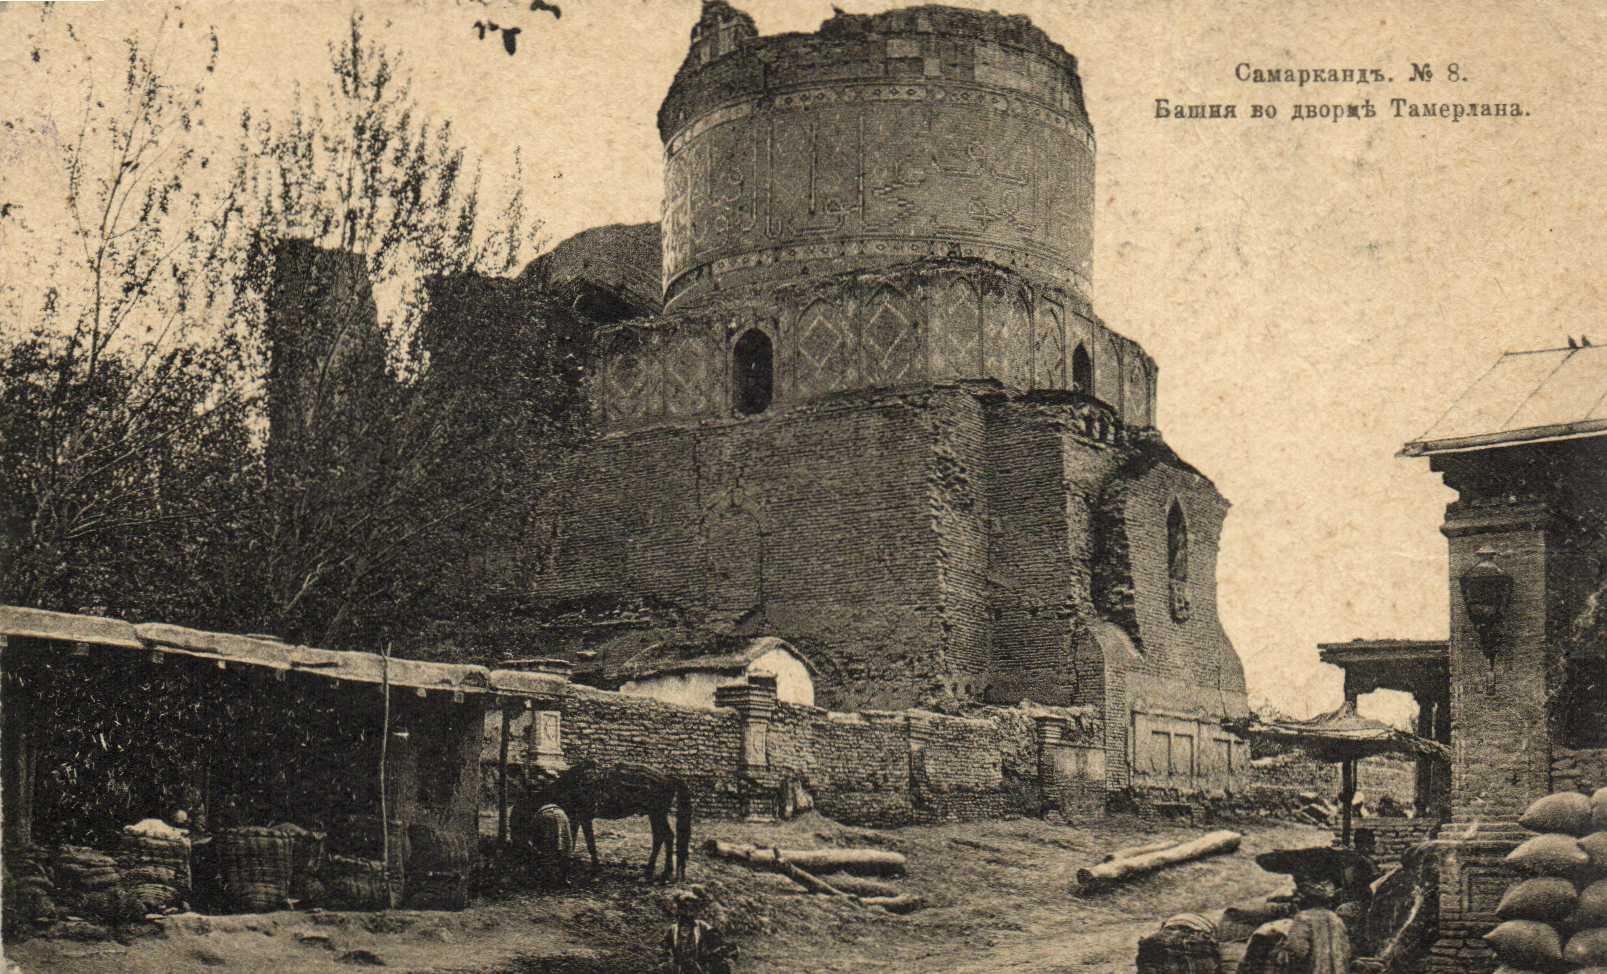 Башня во дворце Тамерлана